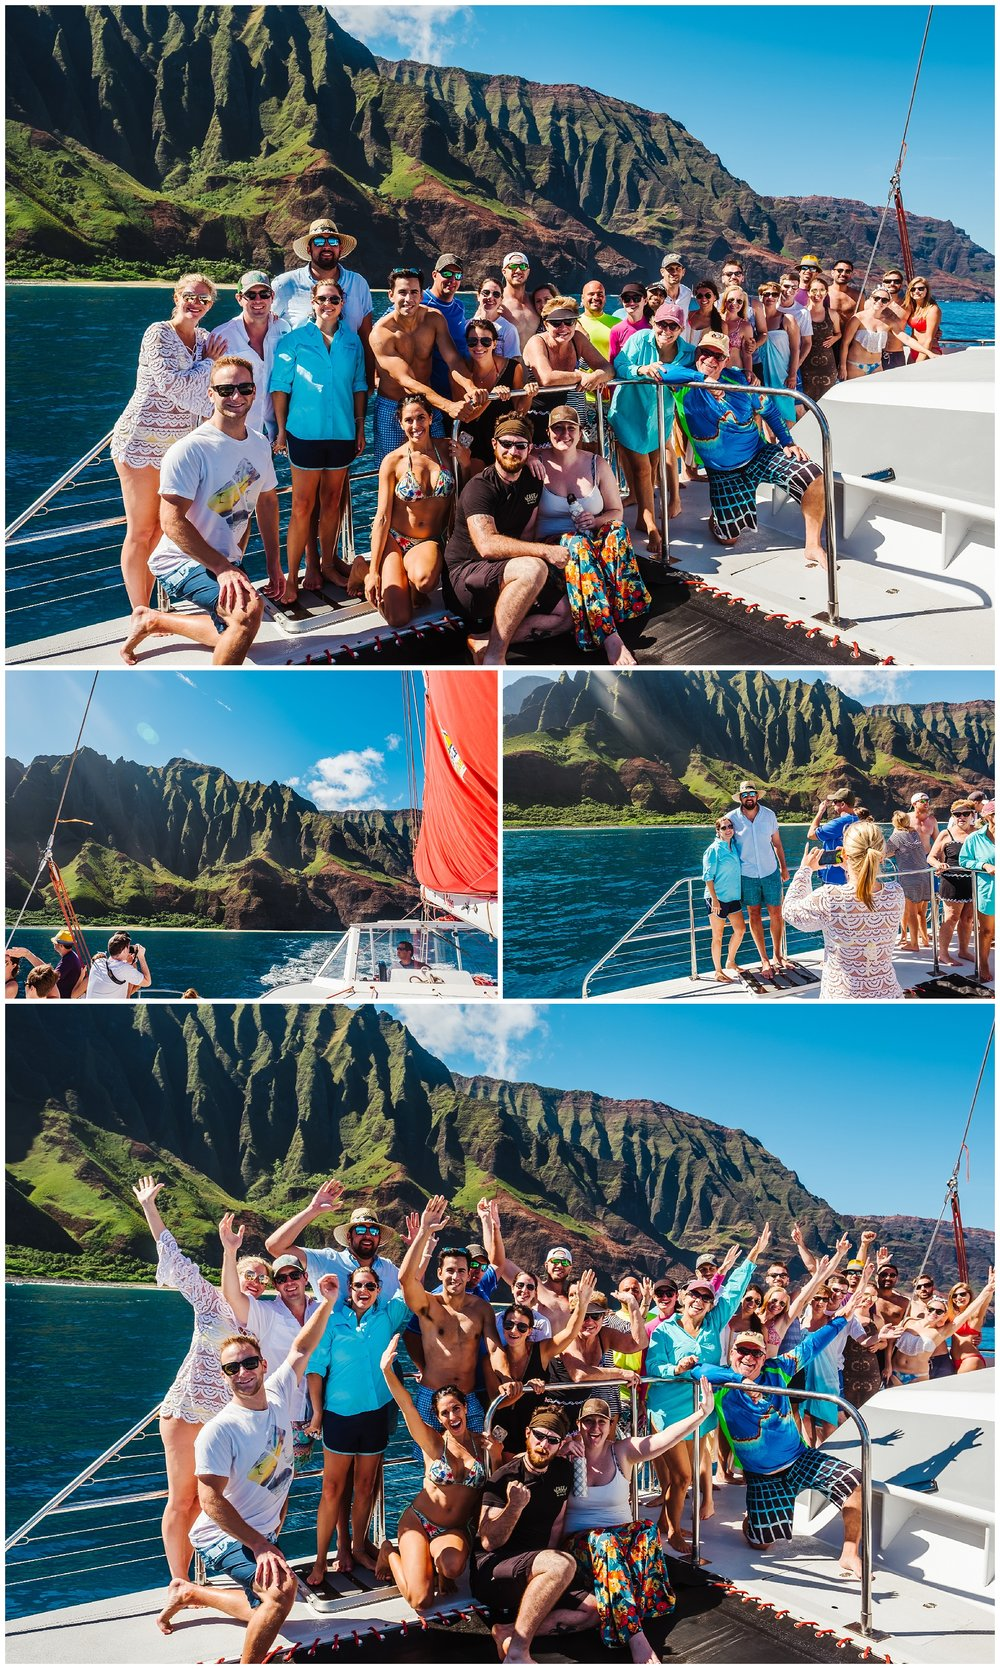 destination-wedding-hawaii-kauai-grand-hyatt-resort-napali-coast-sail_0010.jpg